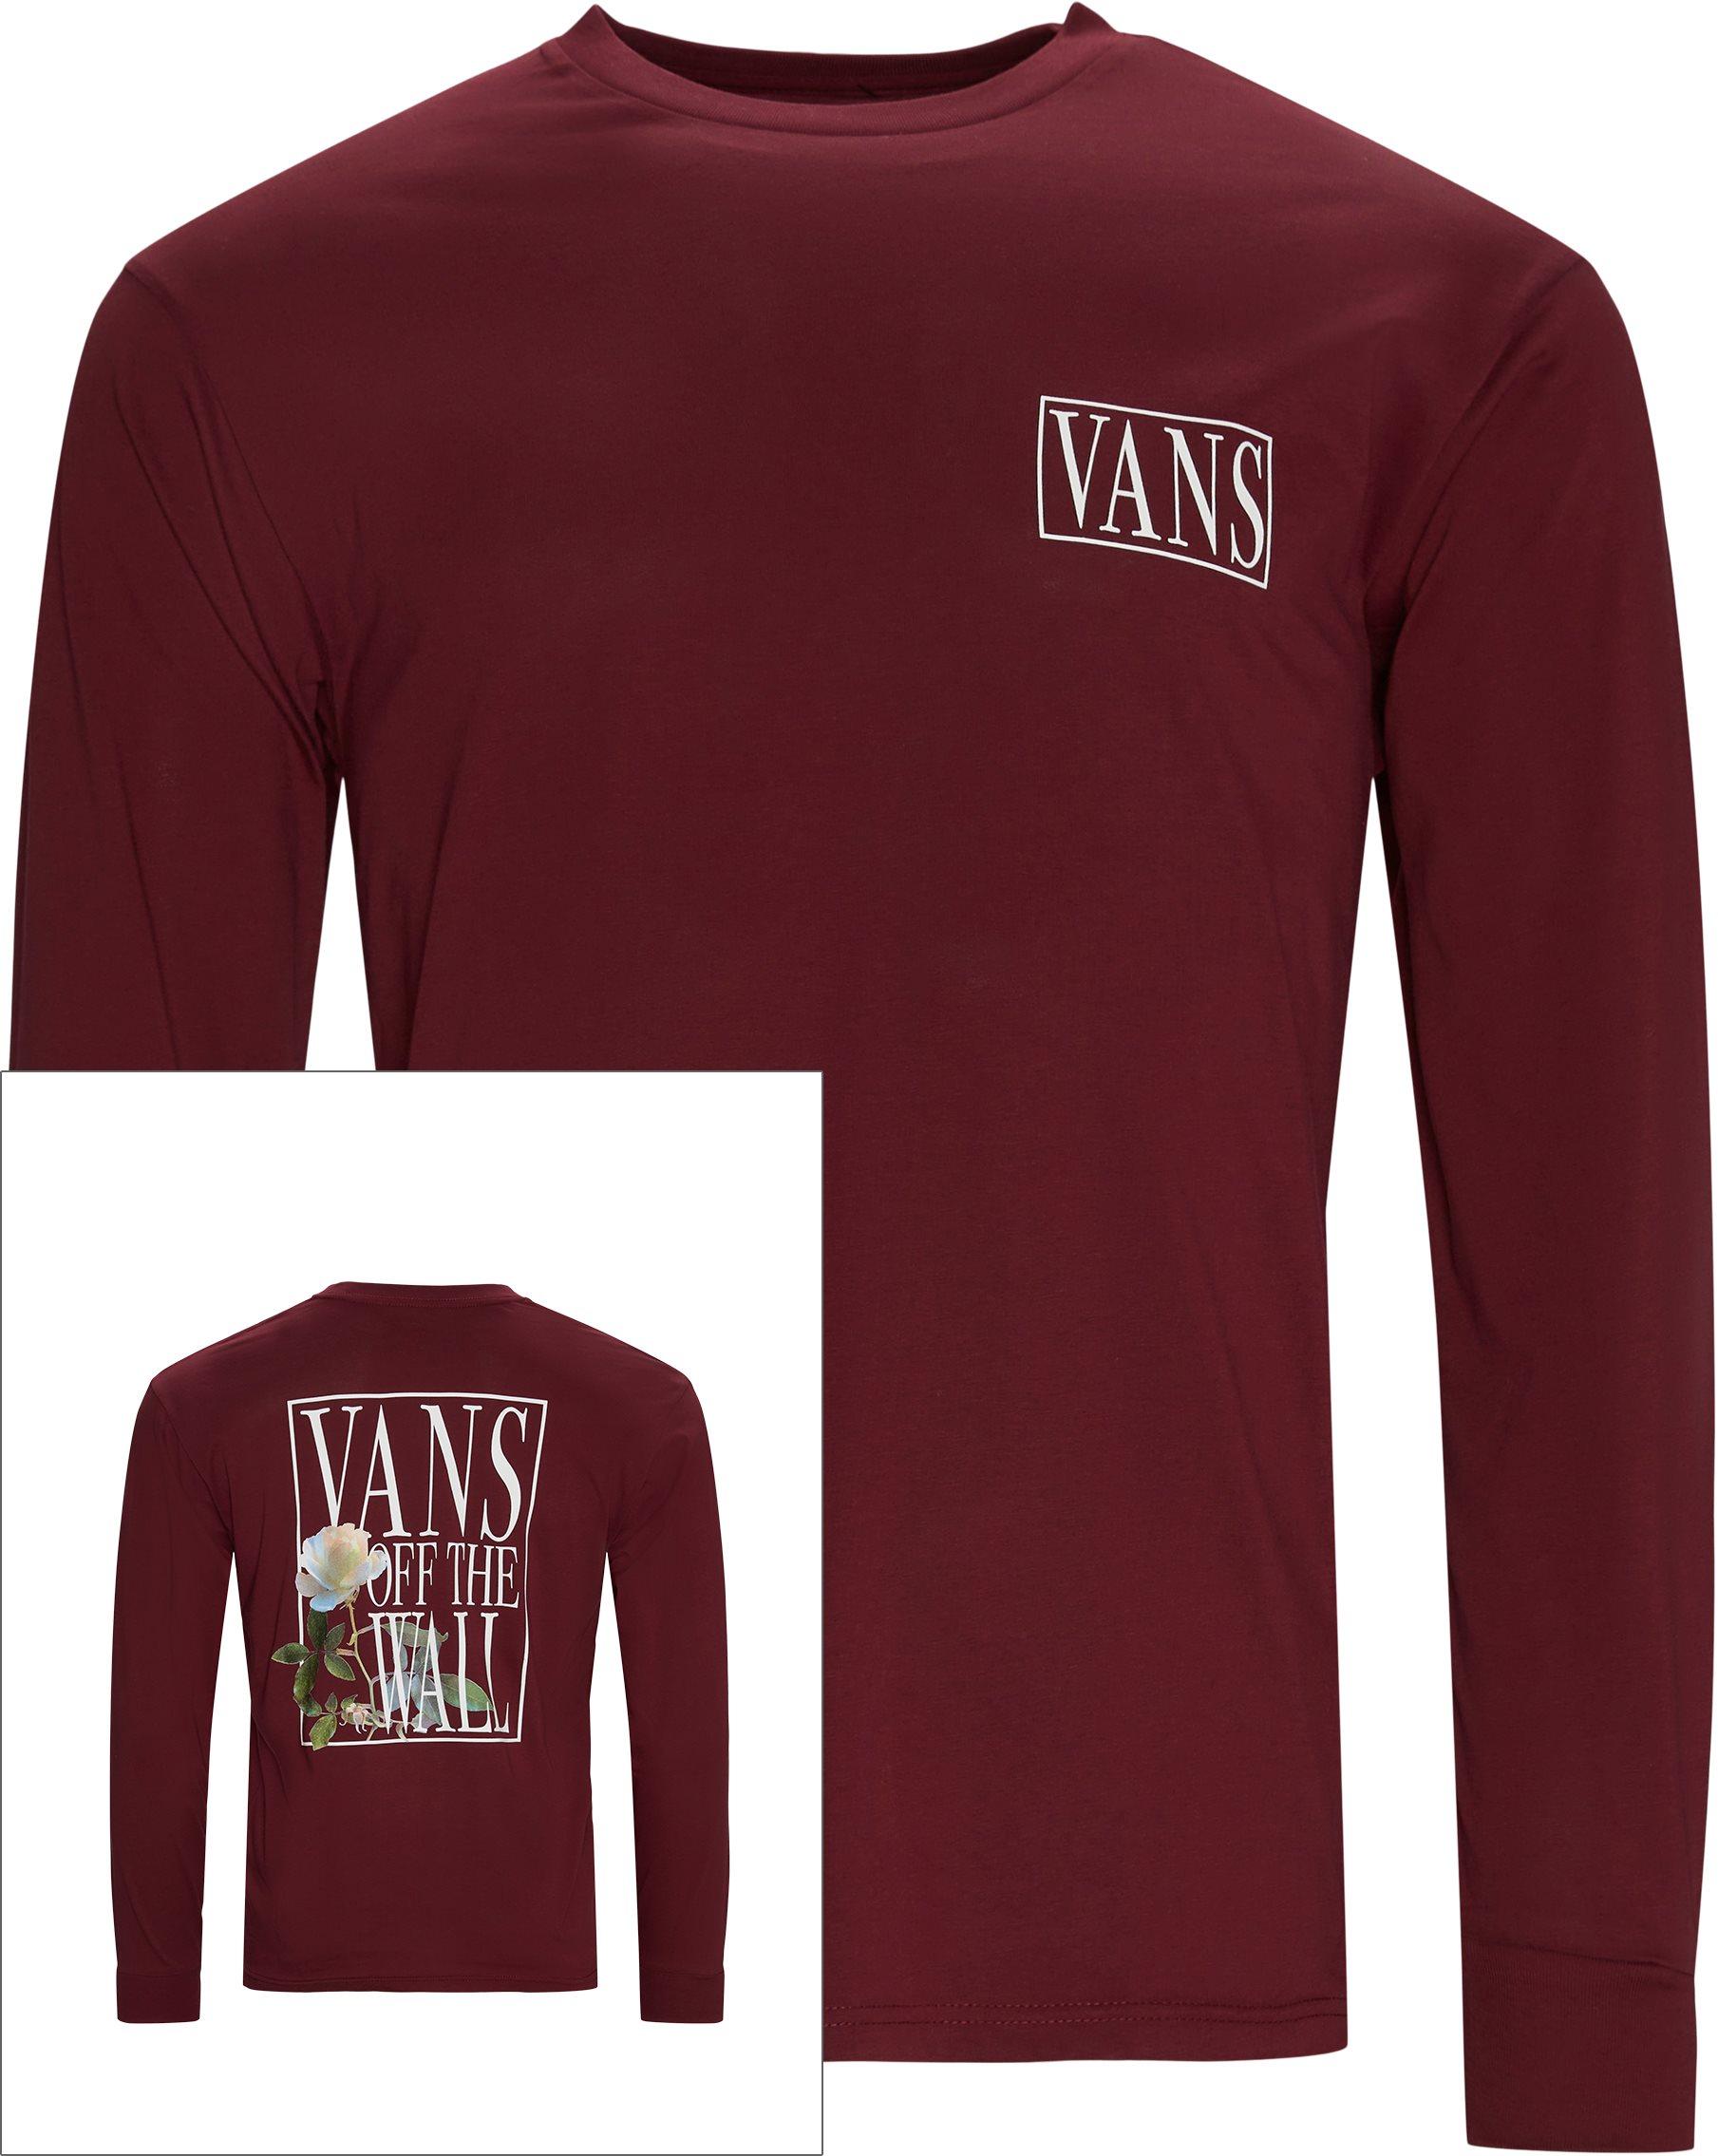 Rose Box LS Tee - T-shirts - Regular fit - Bordeaux